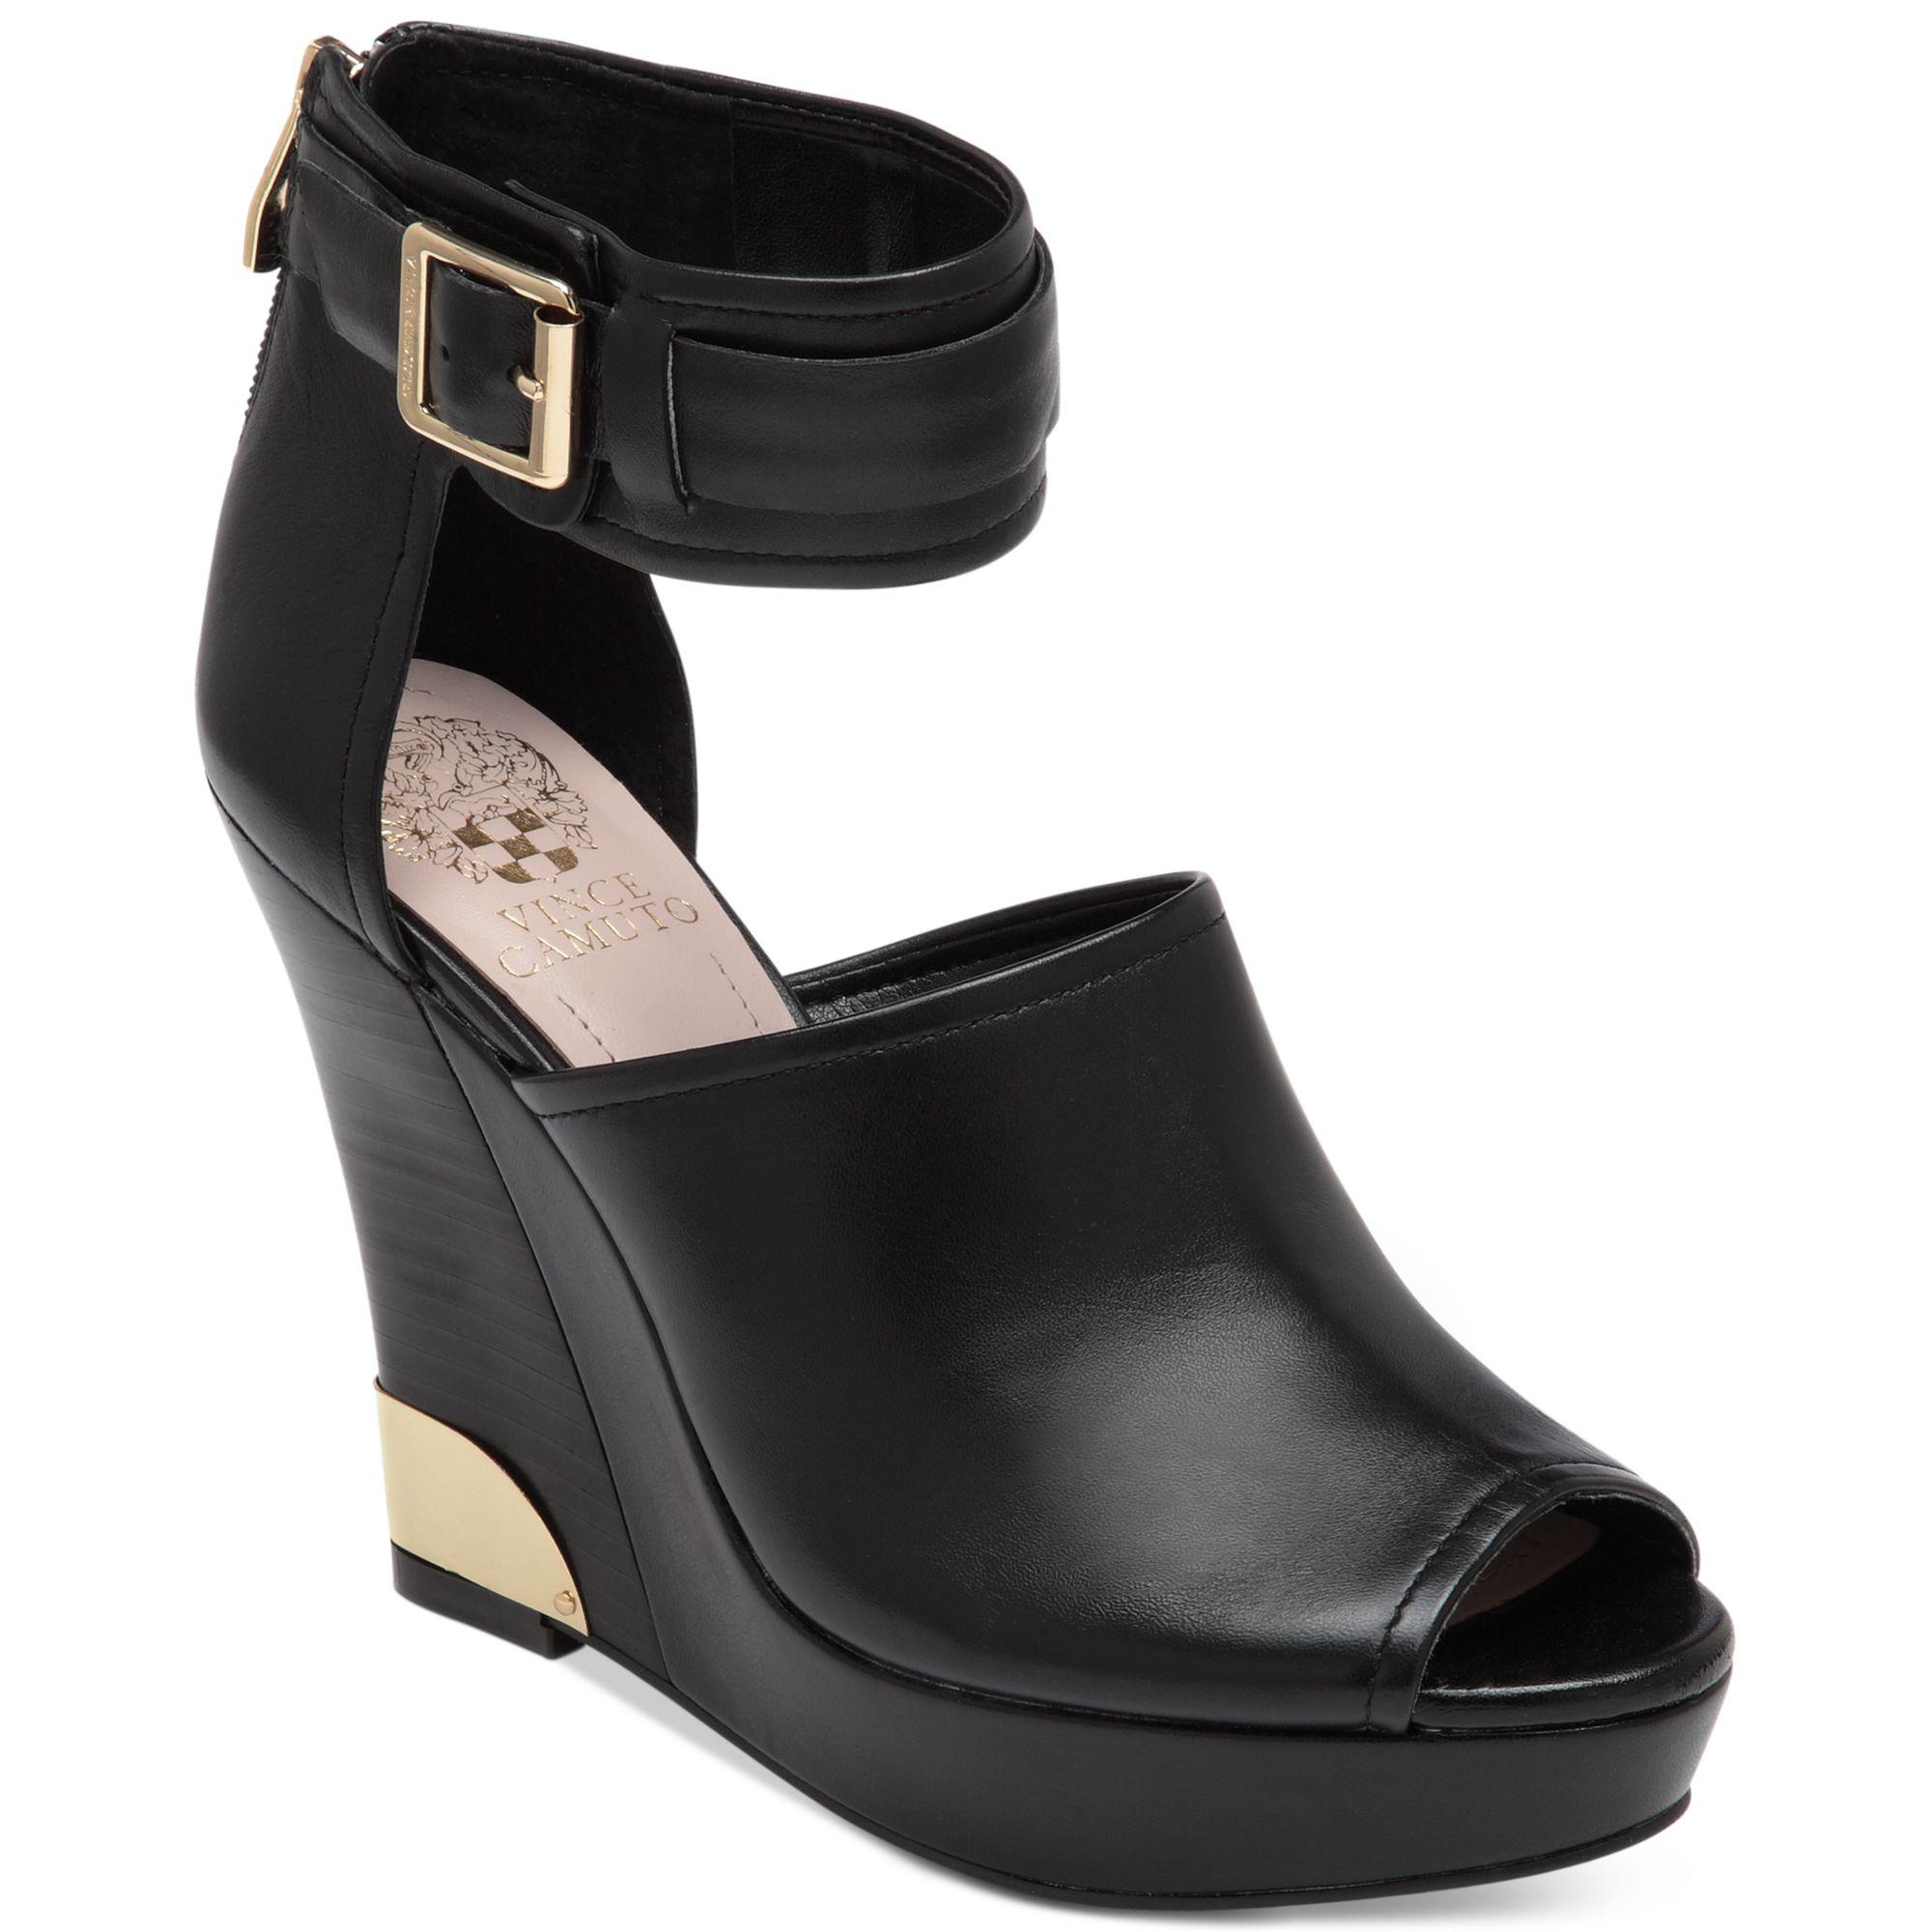 Vince Camuto Wiver Platform Wedge Sandals In Black Lyst